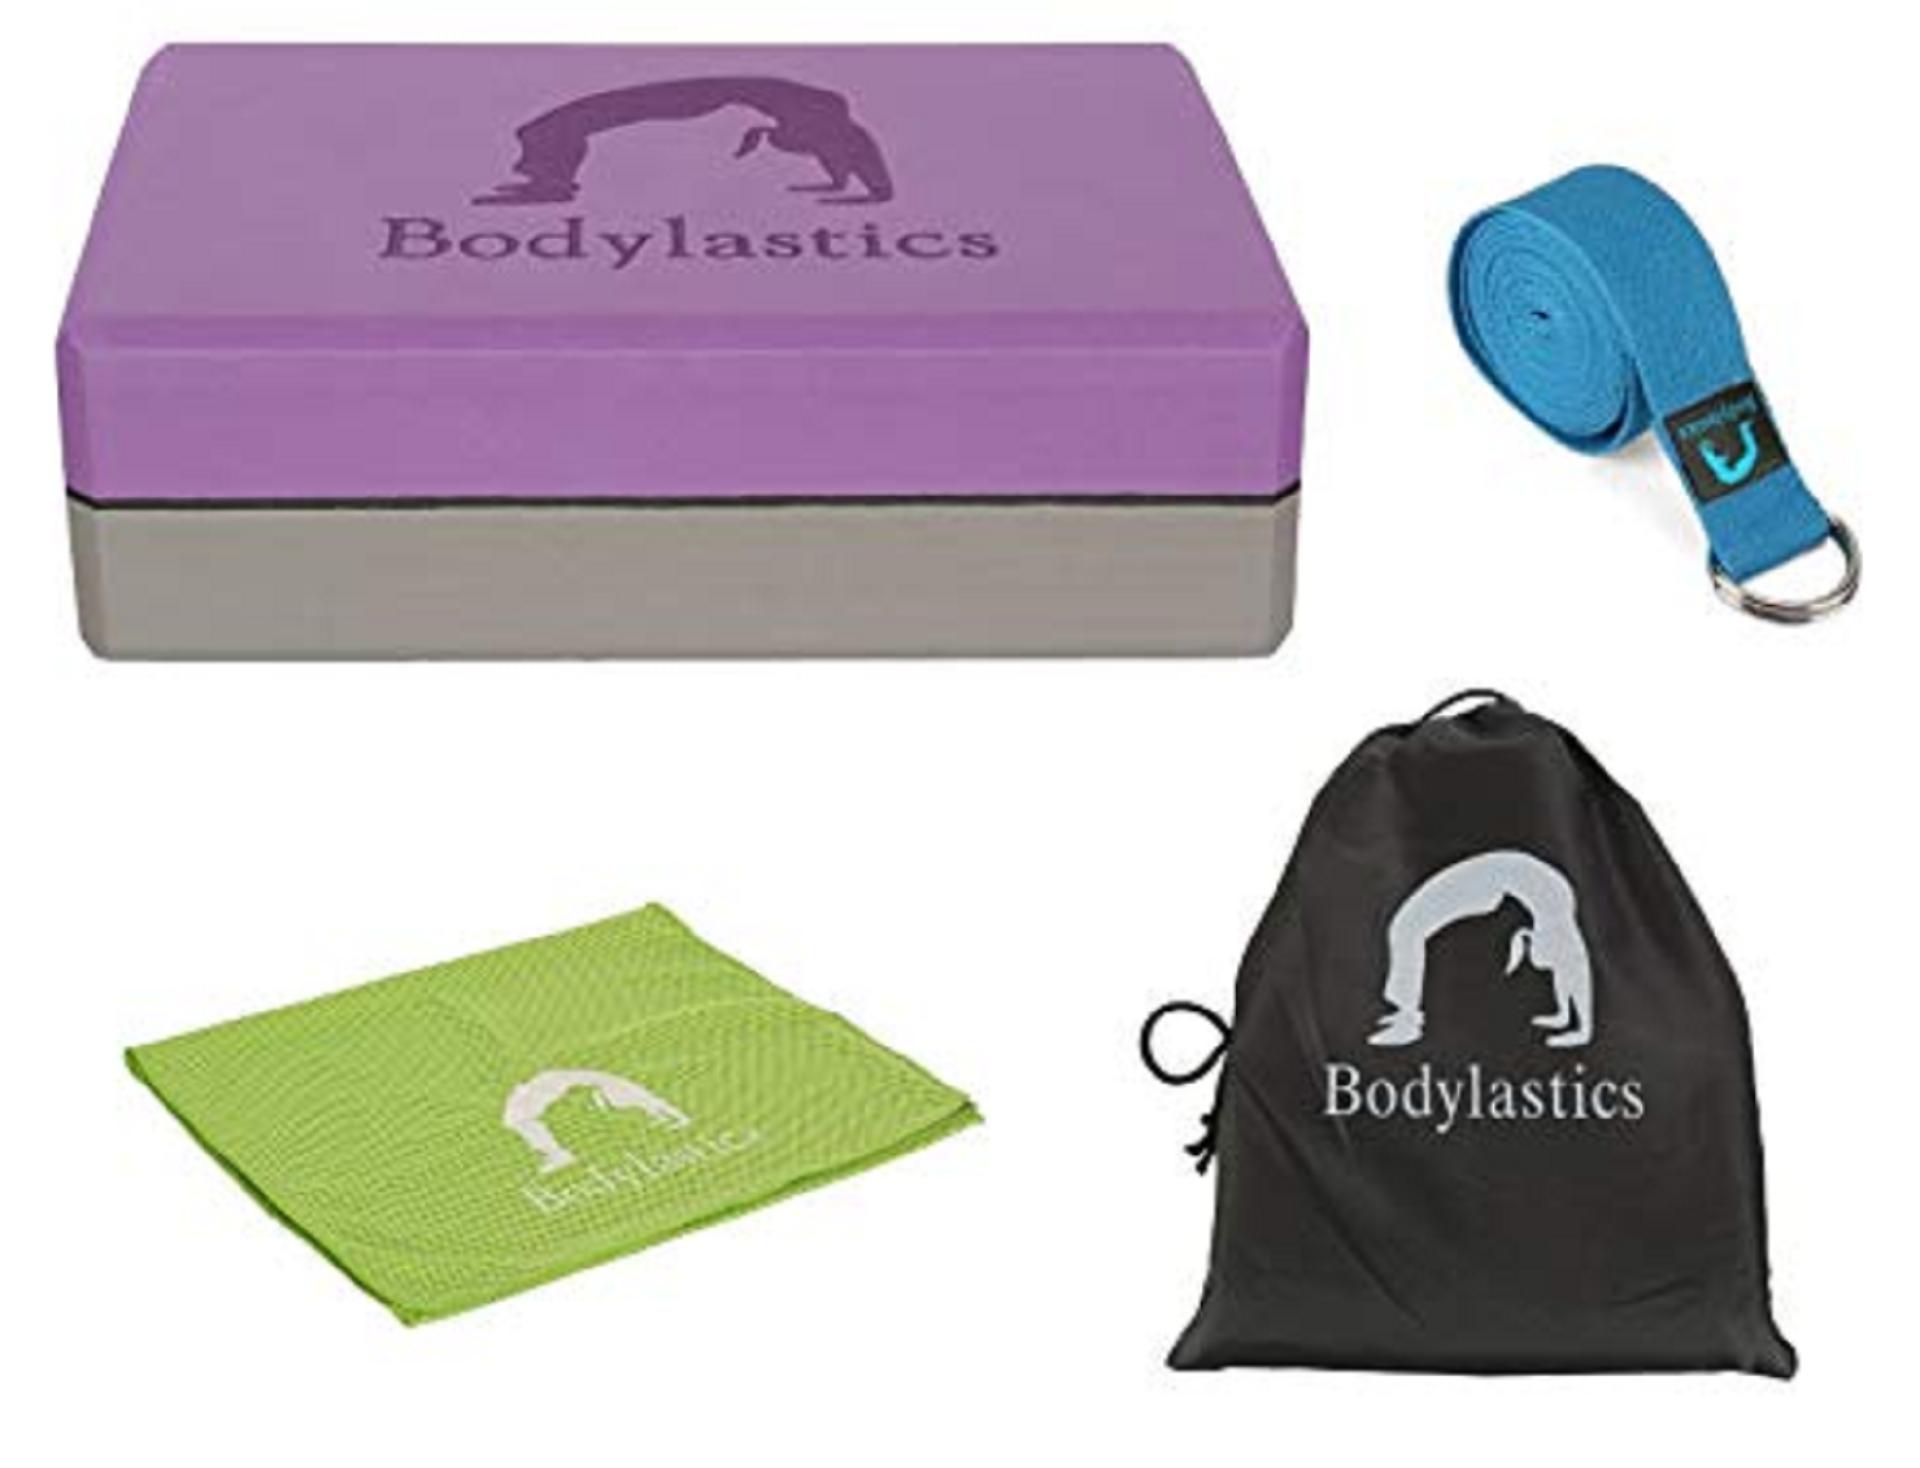 bodylastics yoga kit